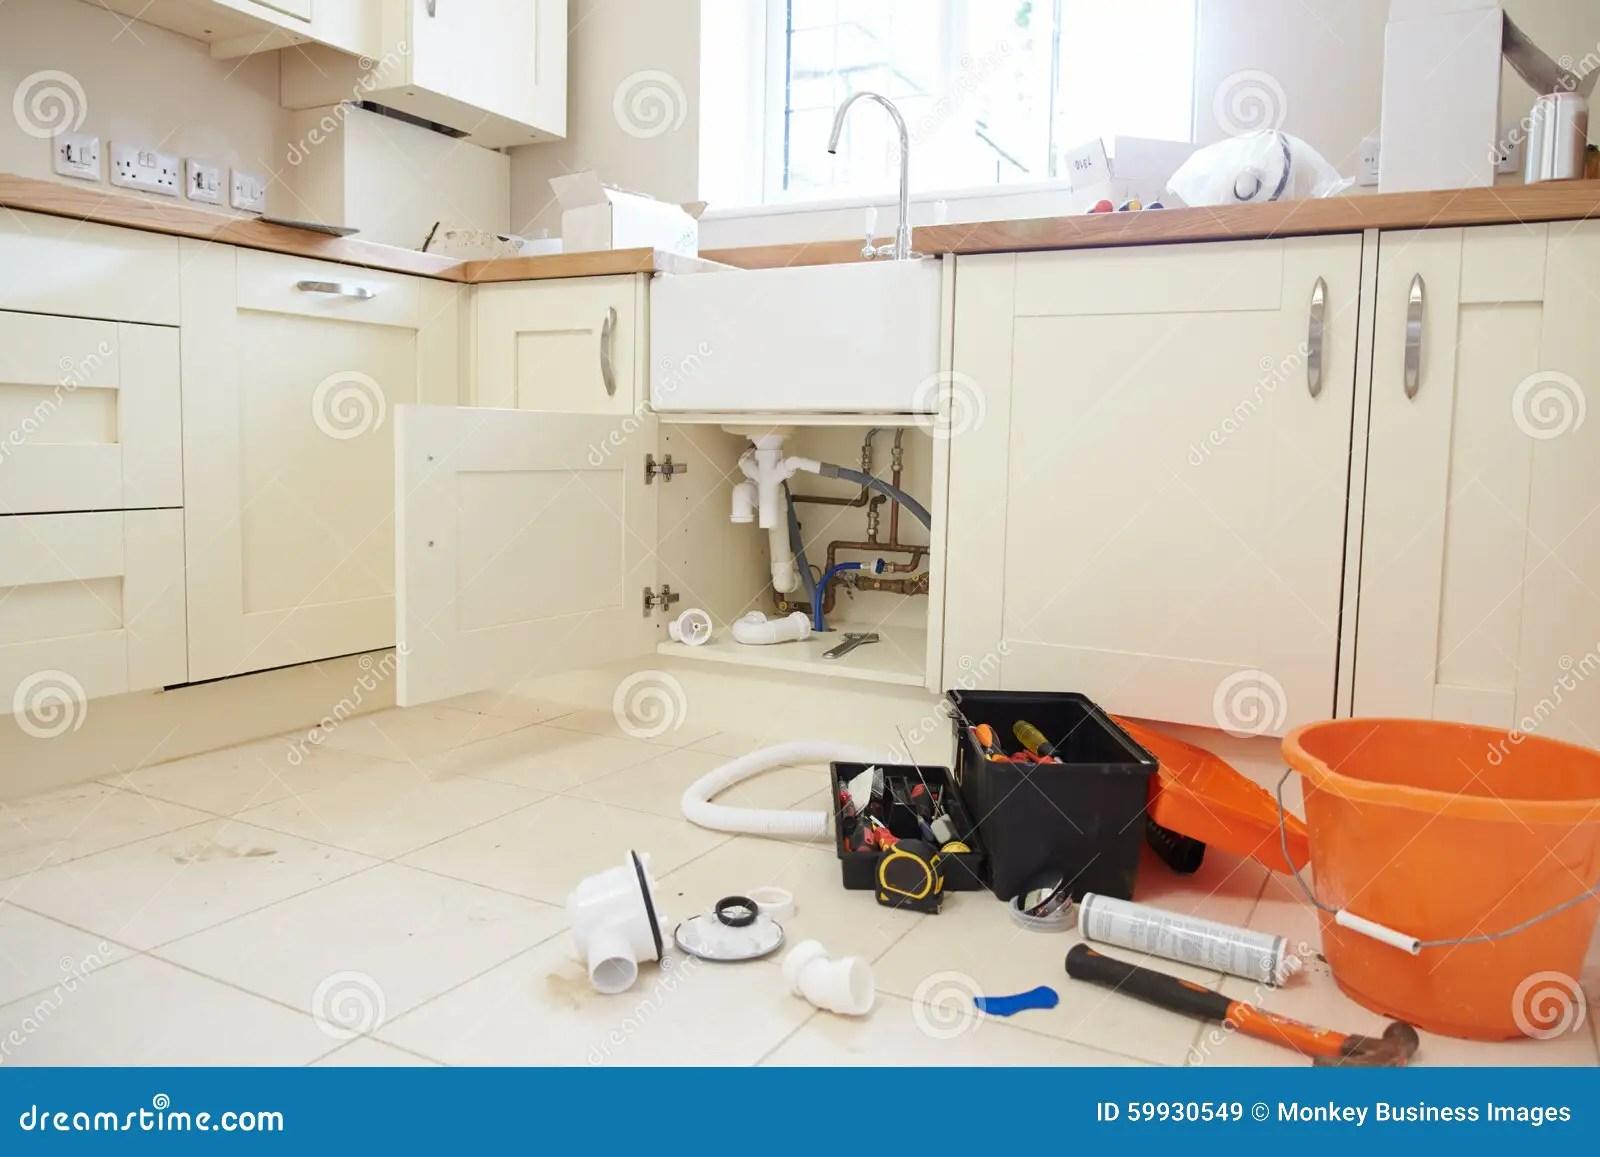 kitchen floor danze parma faucet plumbera s工具和设备在厨房地板上库存图片 图片包括有空间 管道 s工具和设备在厨房地板上